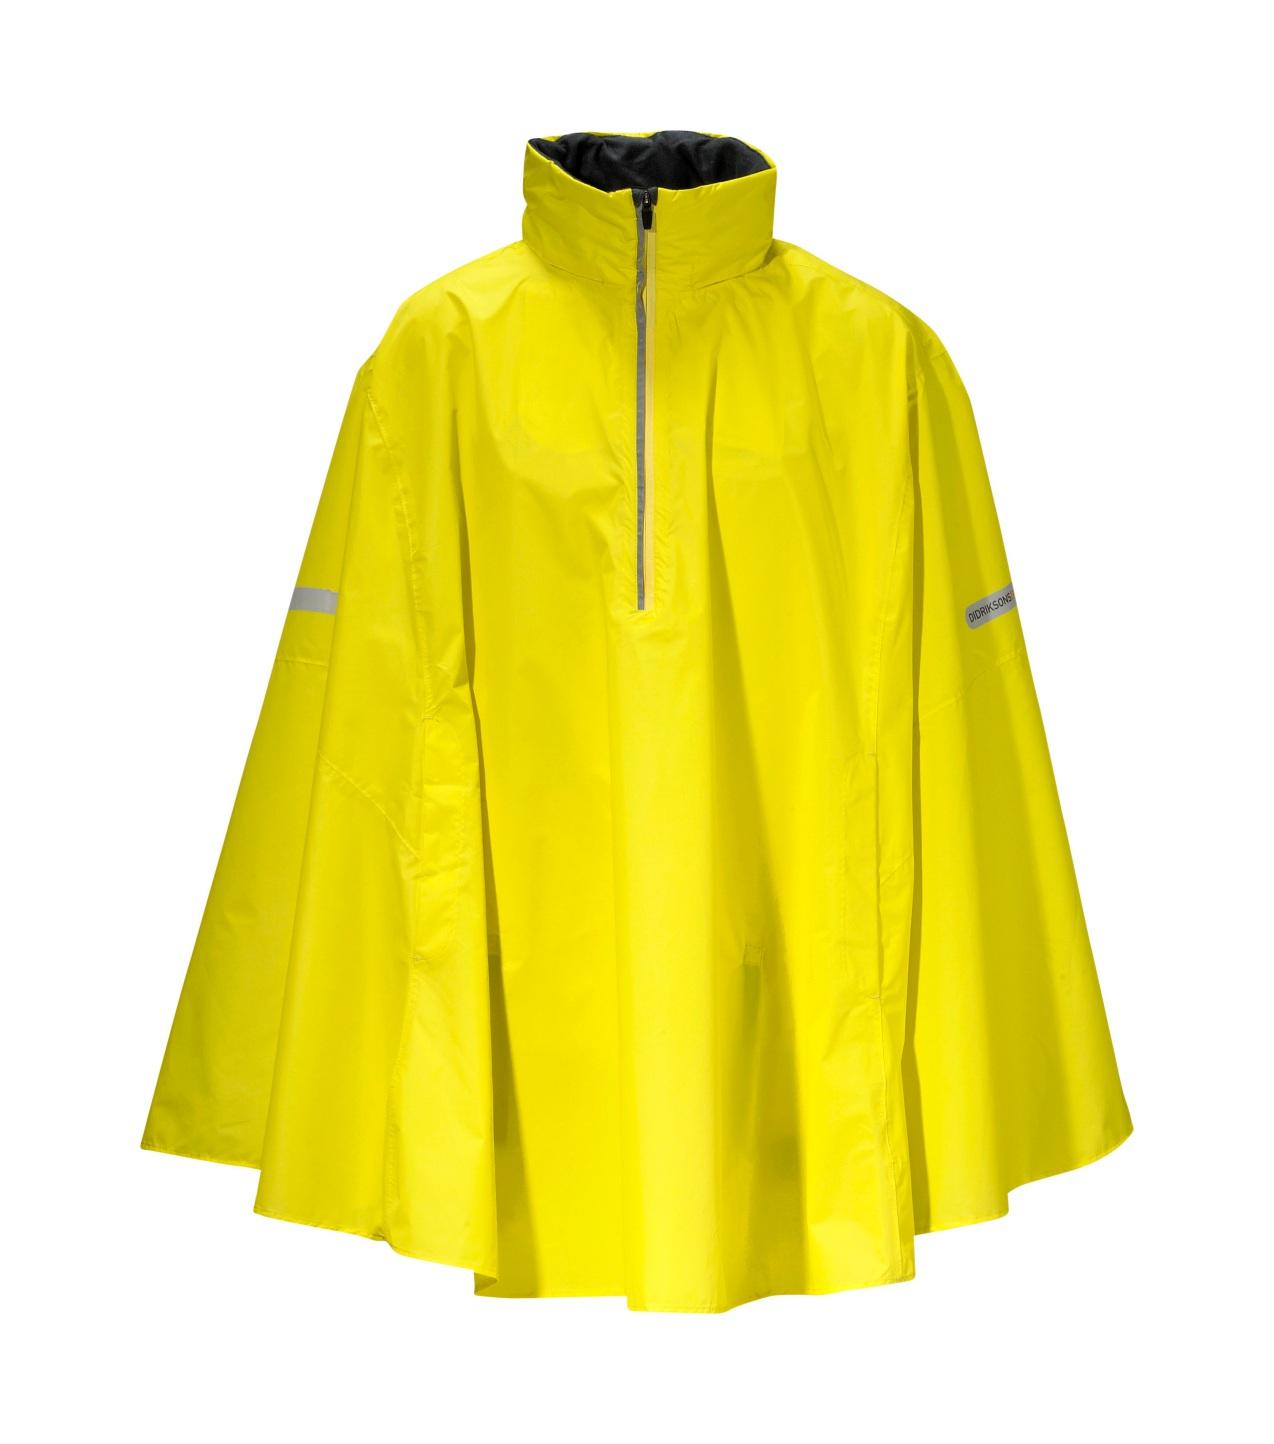 Didriksons Wheely Waterproof Cape - Yellow